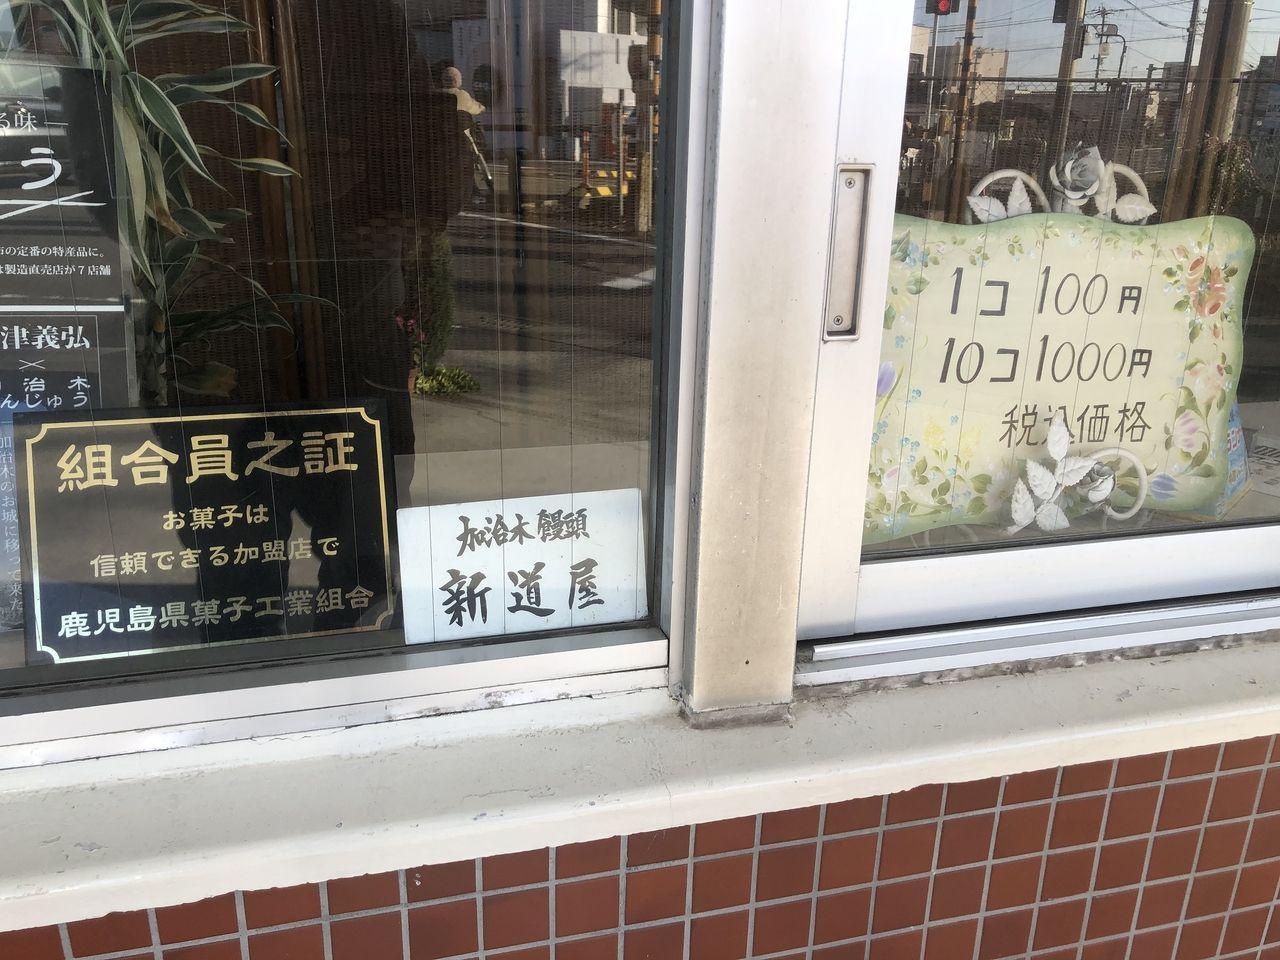 姶良市加治木町「新道屋」加治木饅頭の有名店です。組合員